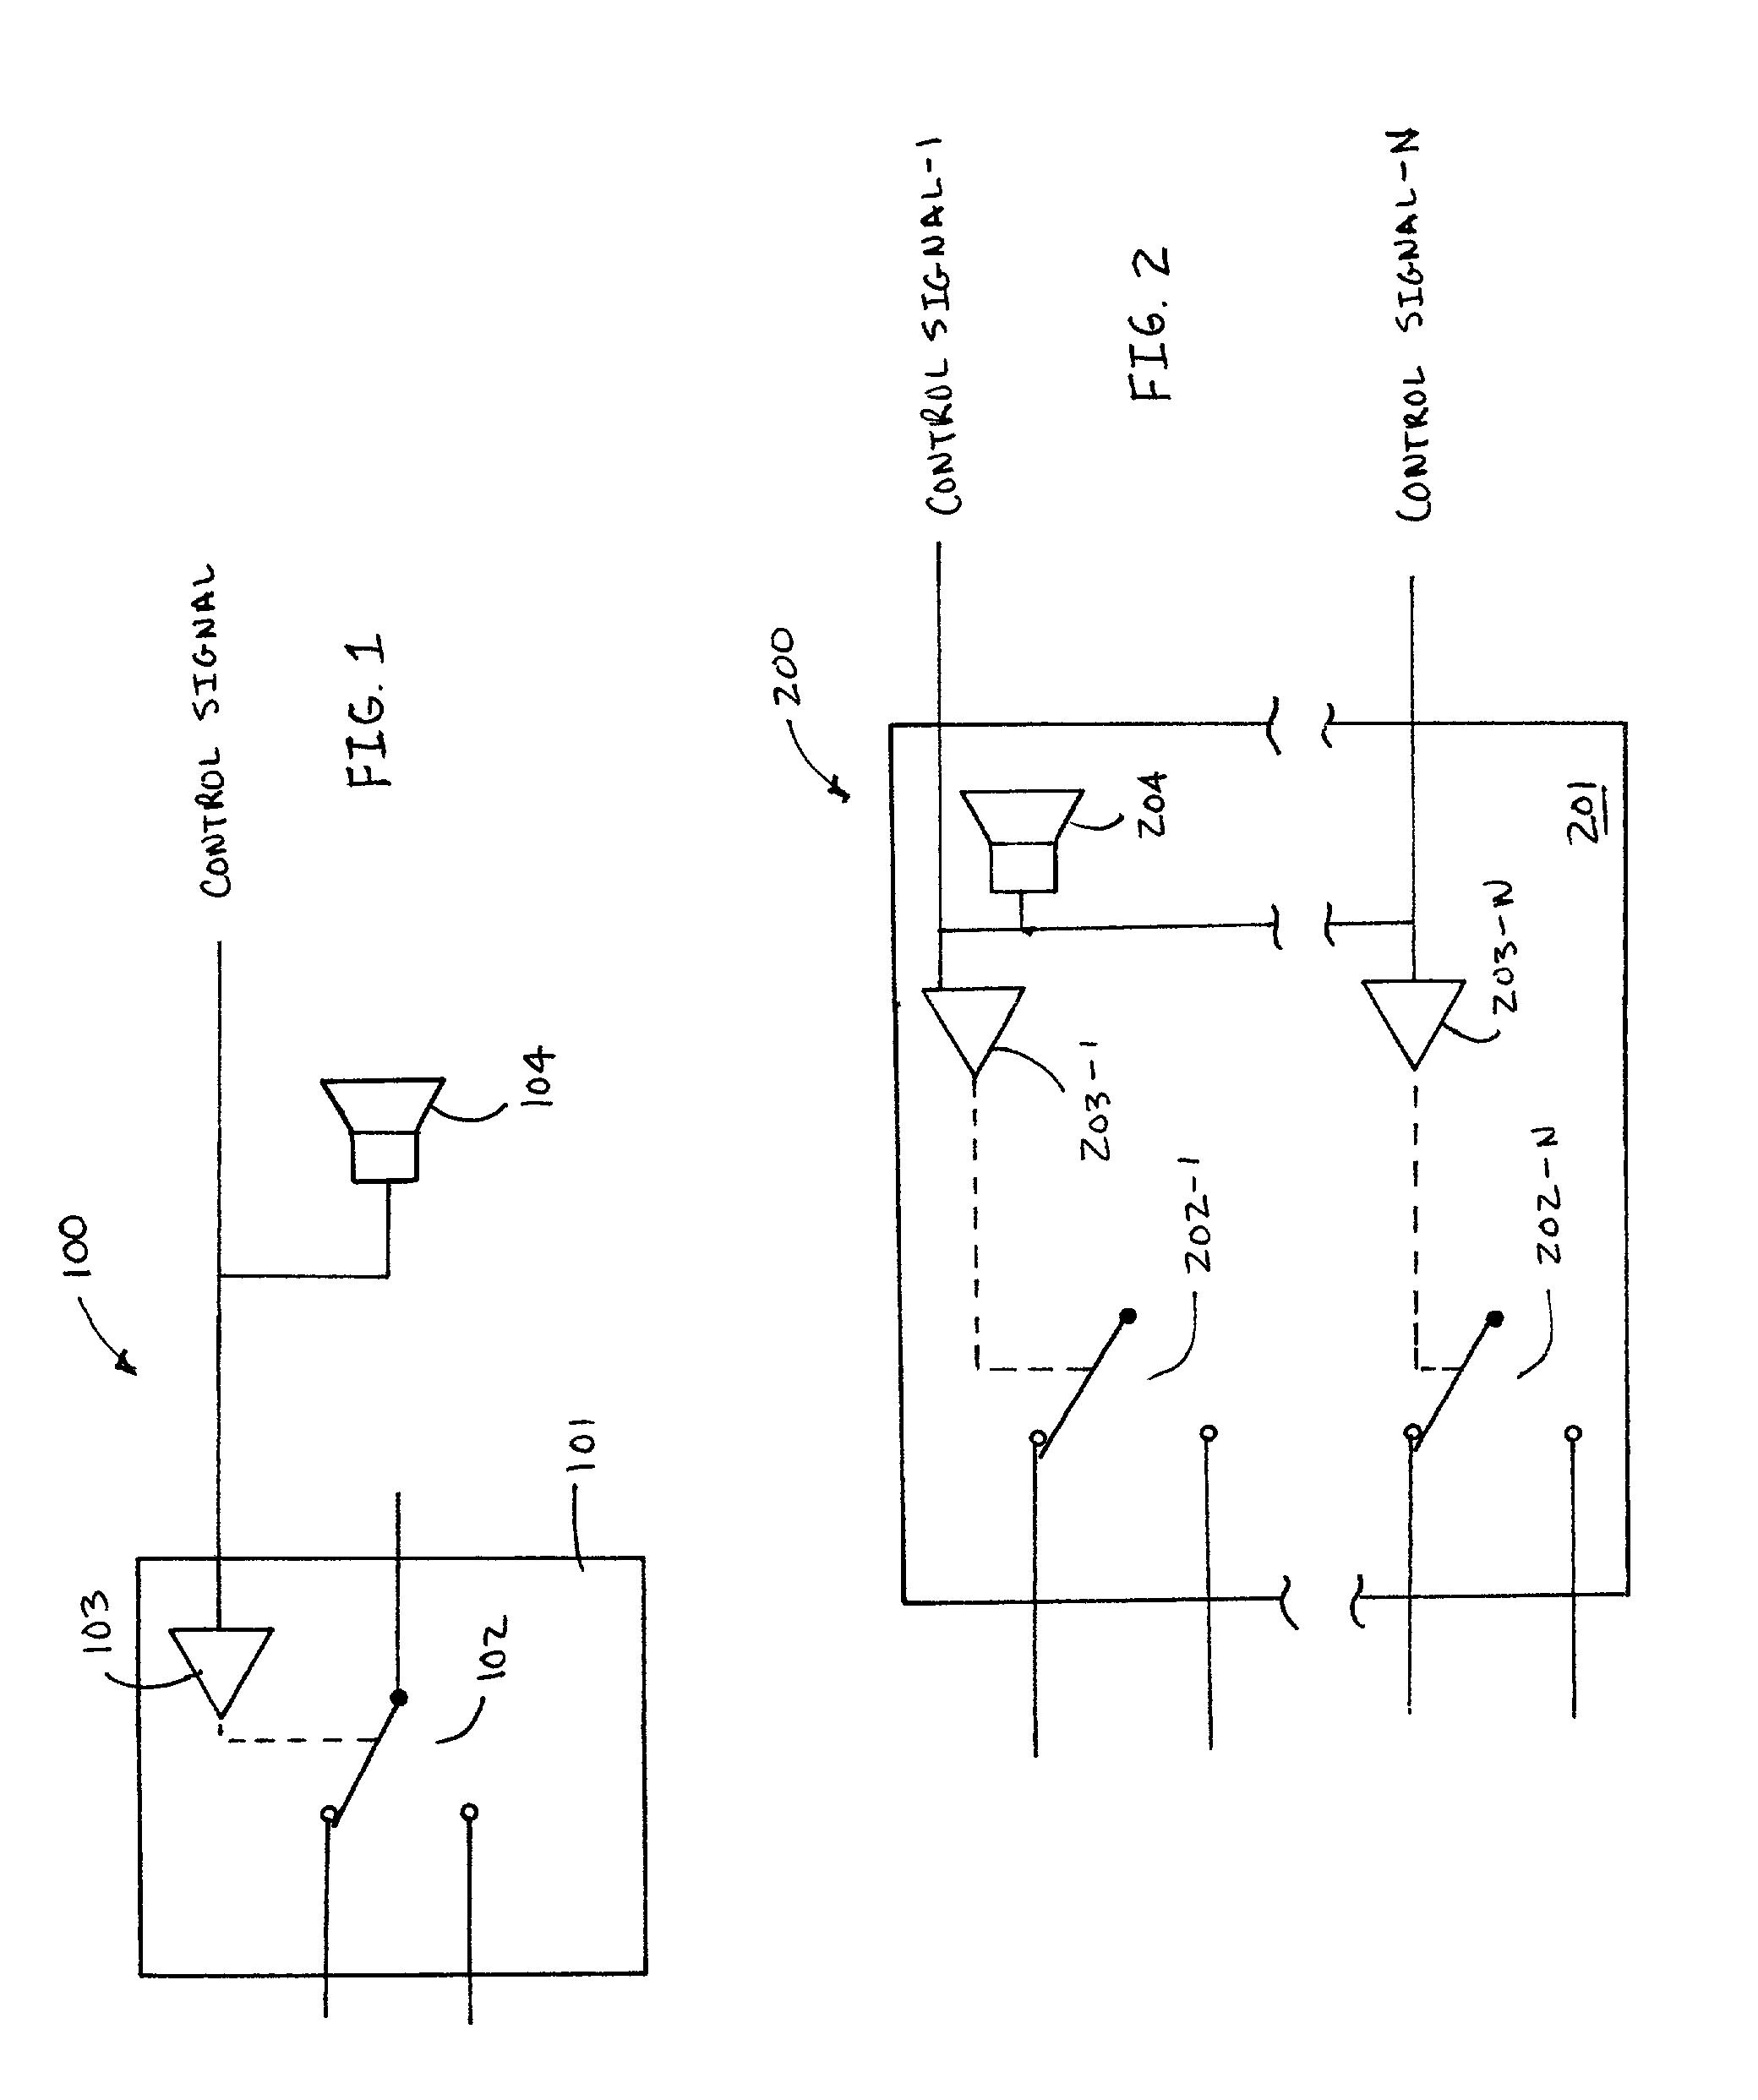 patent us7119702 - audible relay emulator